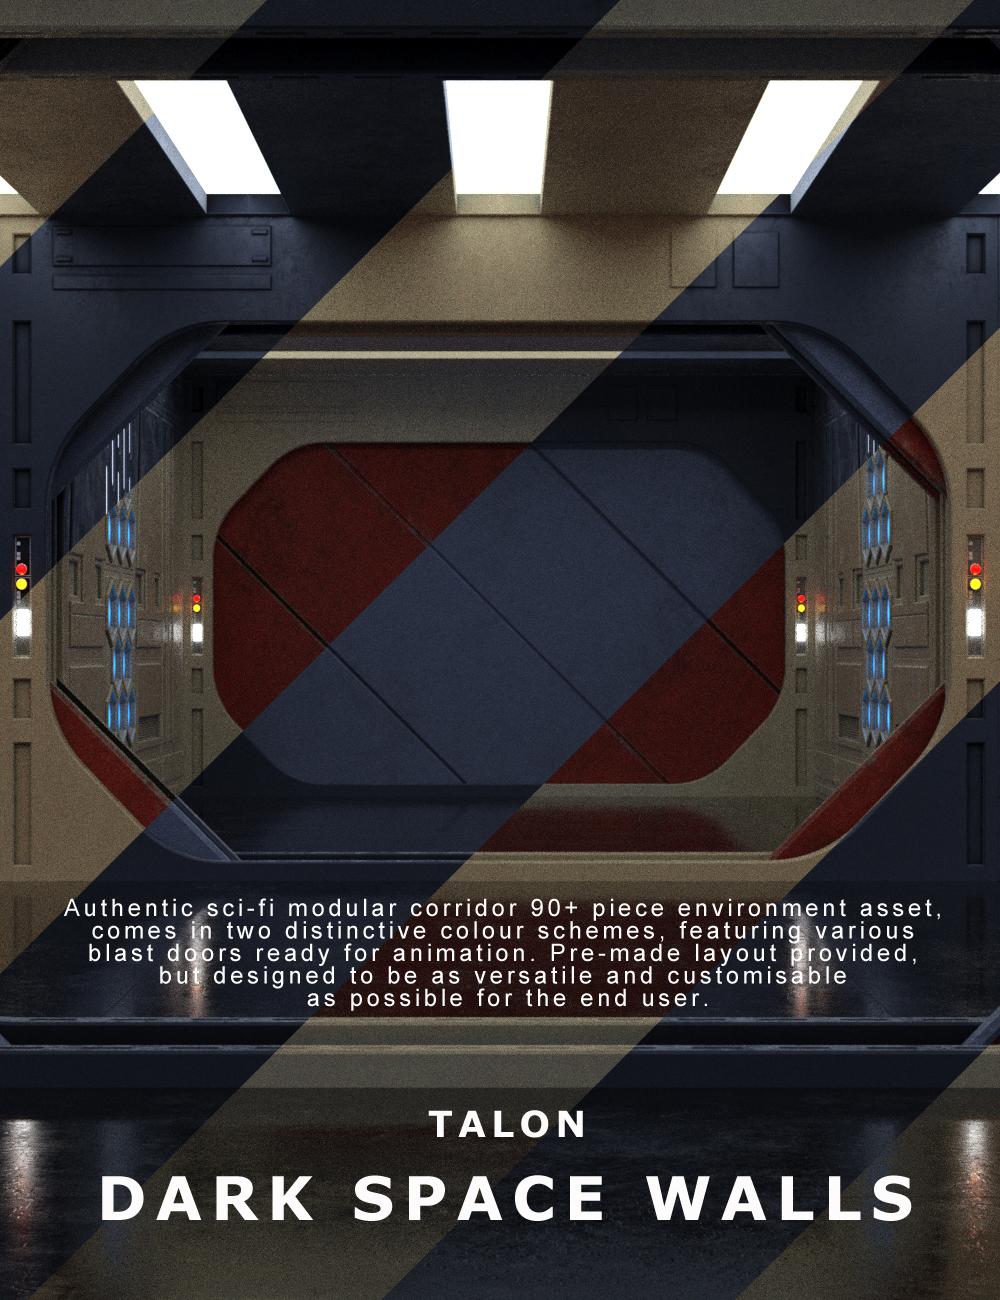 TALON Dark Space Walls by: Talon, 3D Models by Daz 3D